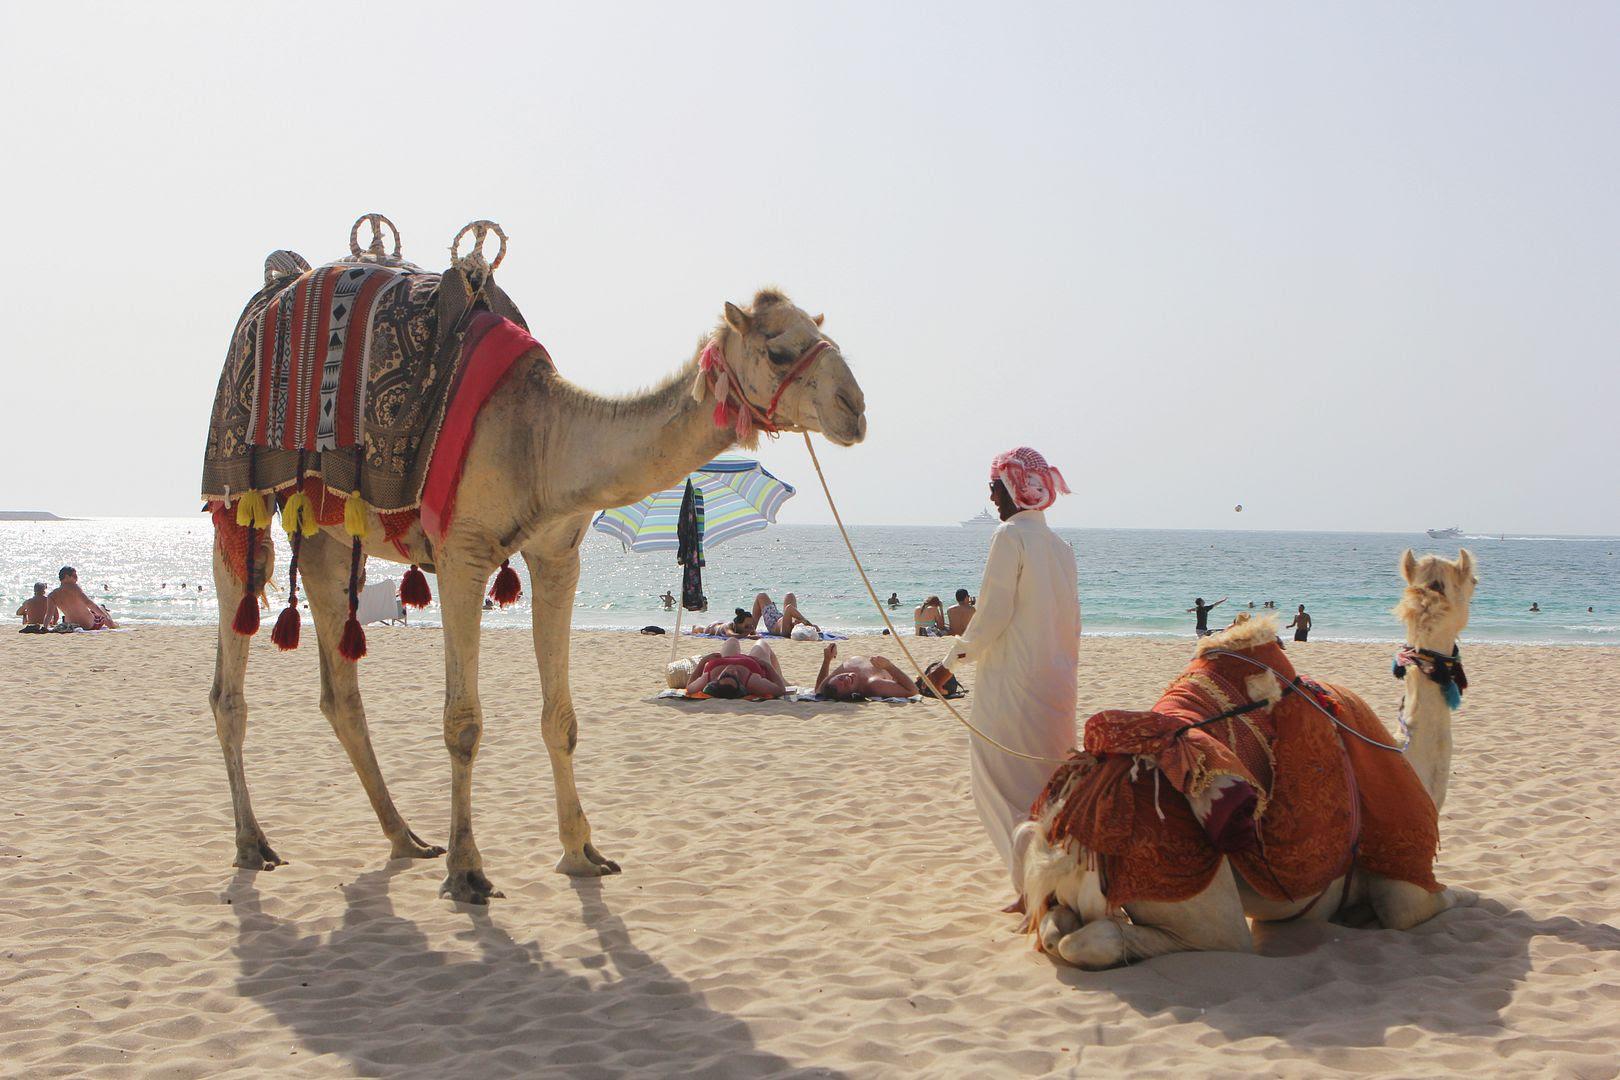 photo camel-dubai-chanelcruisedubai-jmb-beckerman.jpg